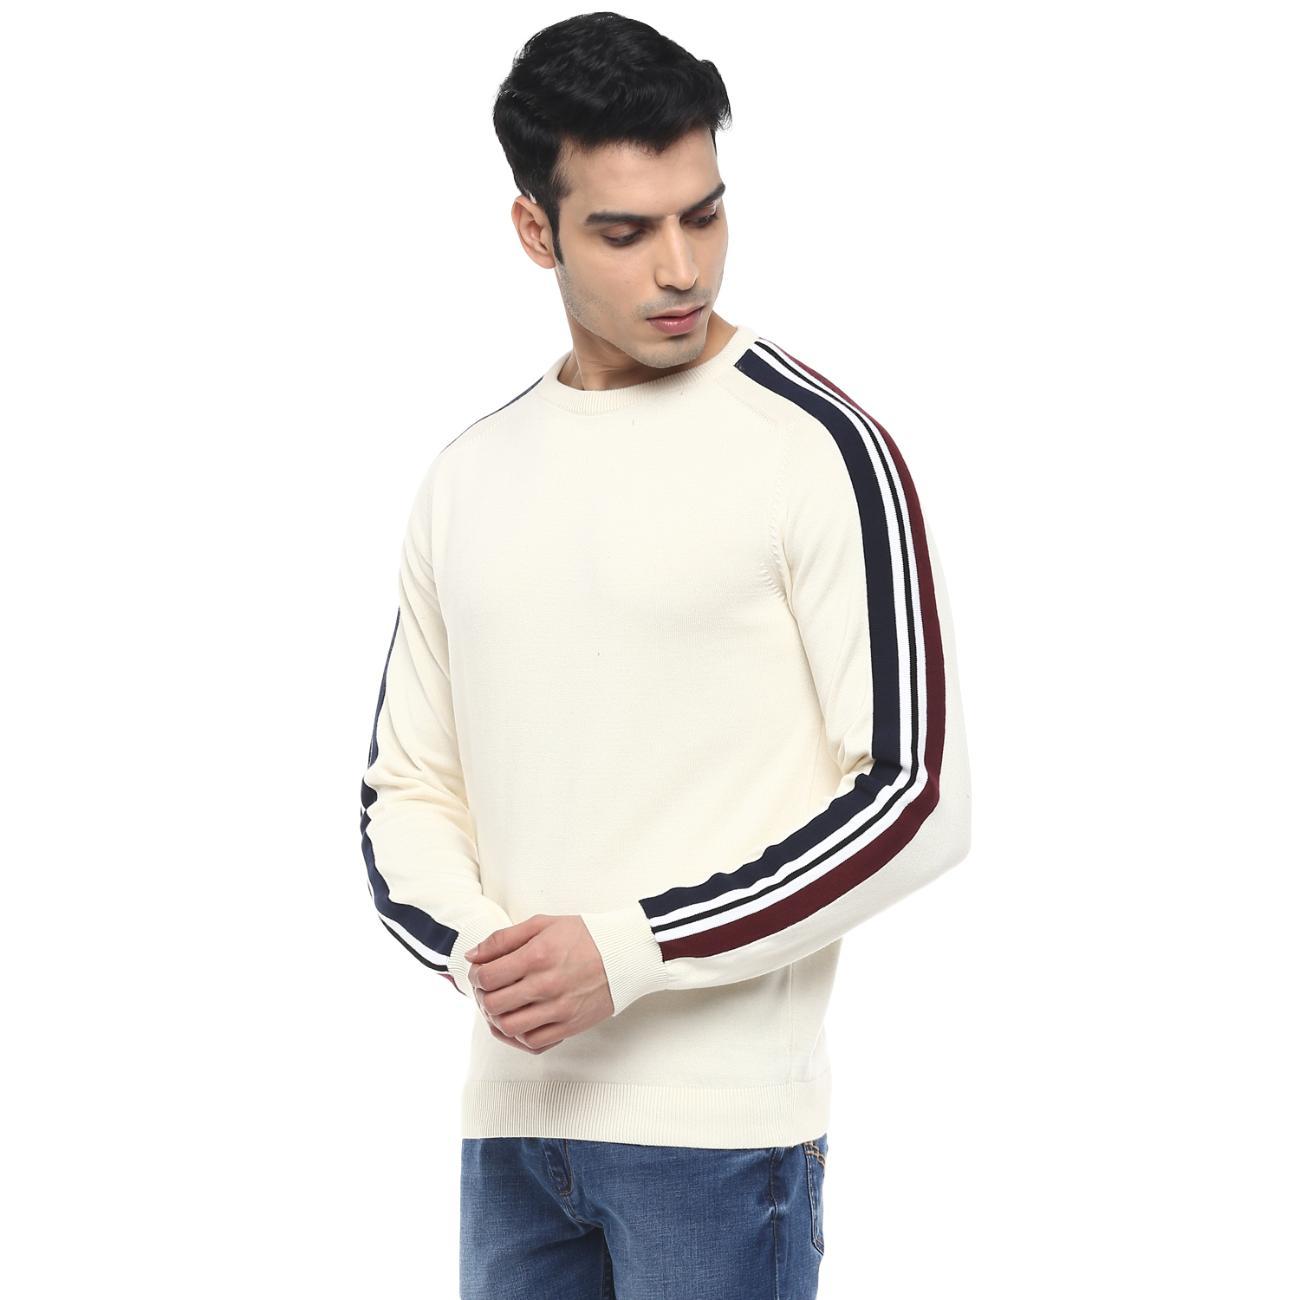 Men's Round Neck Off-white Casual Sweater